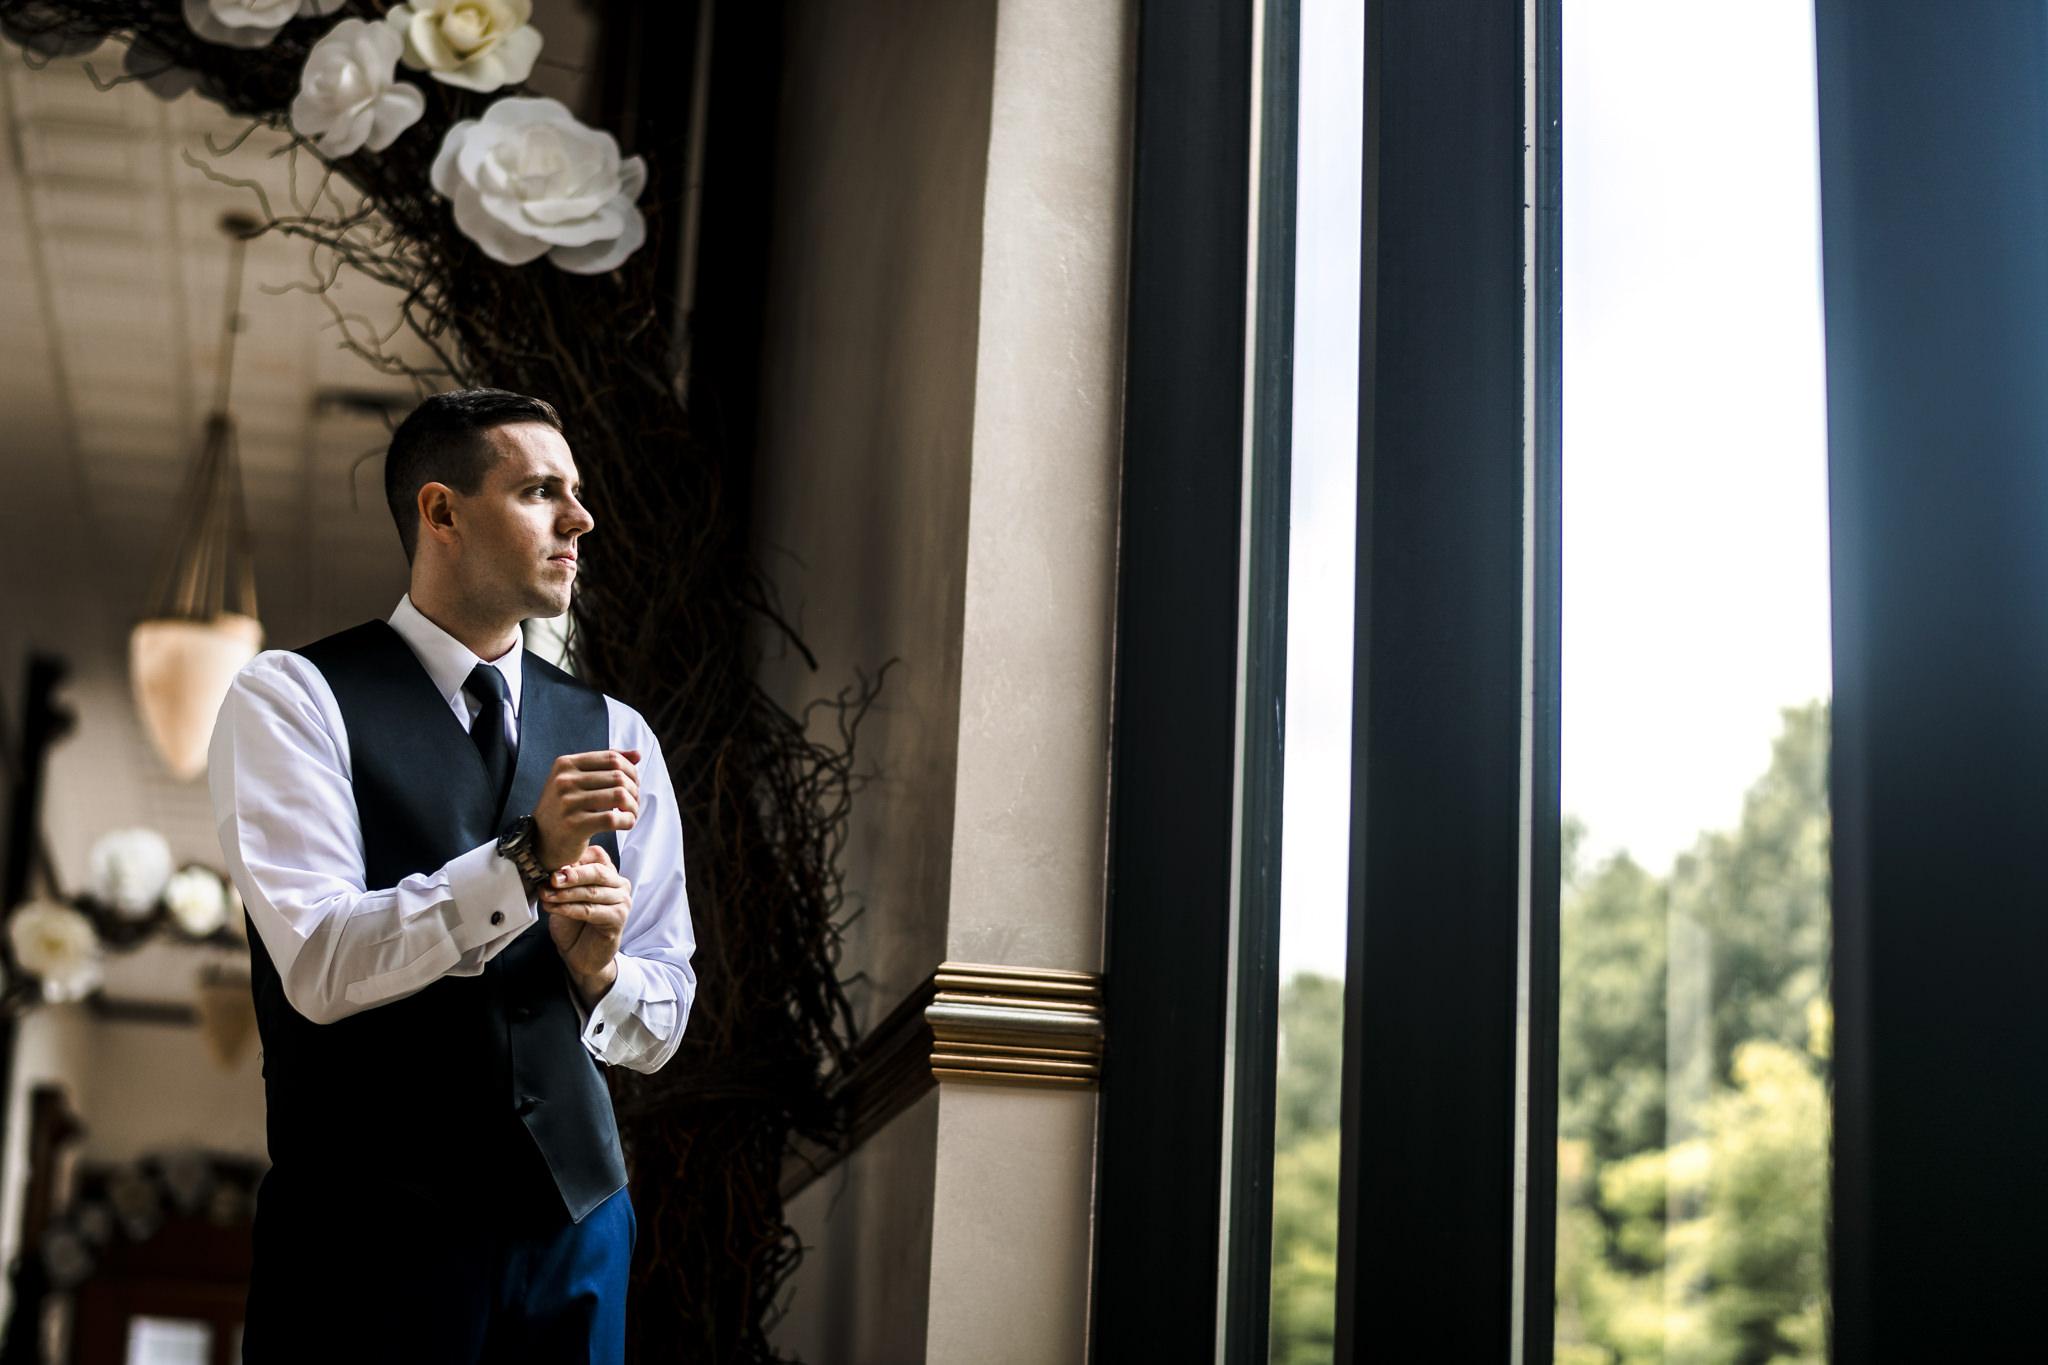 Brennan-South-Gate-Manor-New-Jersey-Wedding-Photographer-08.JPG